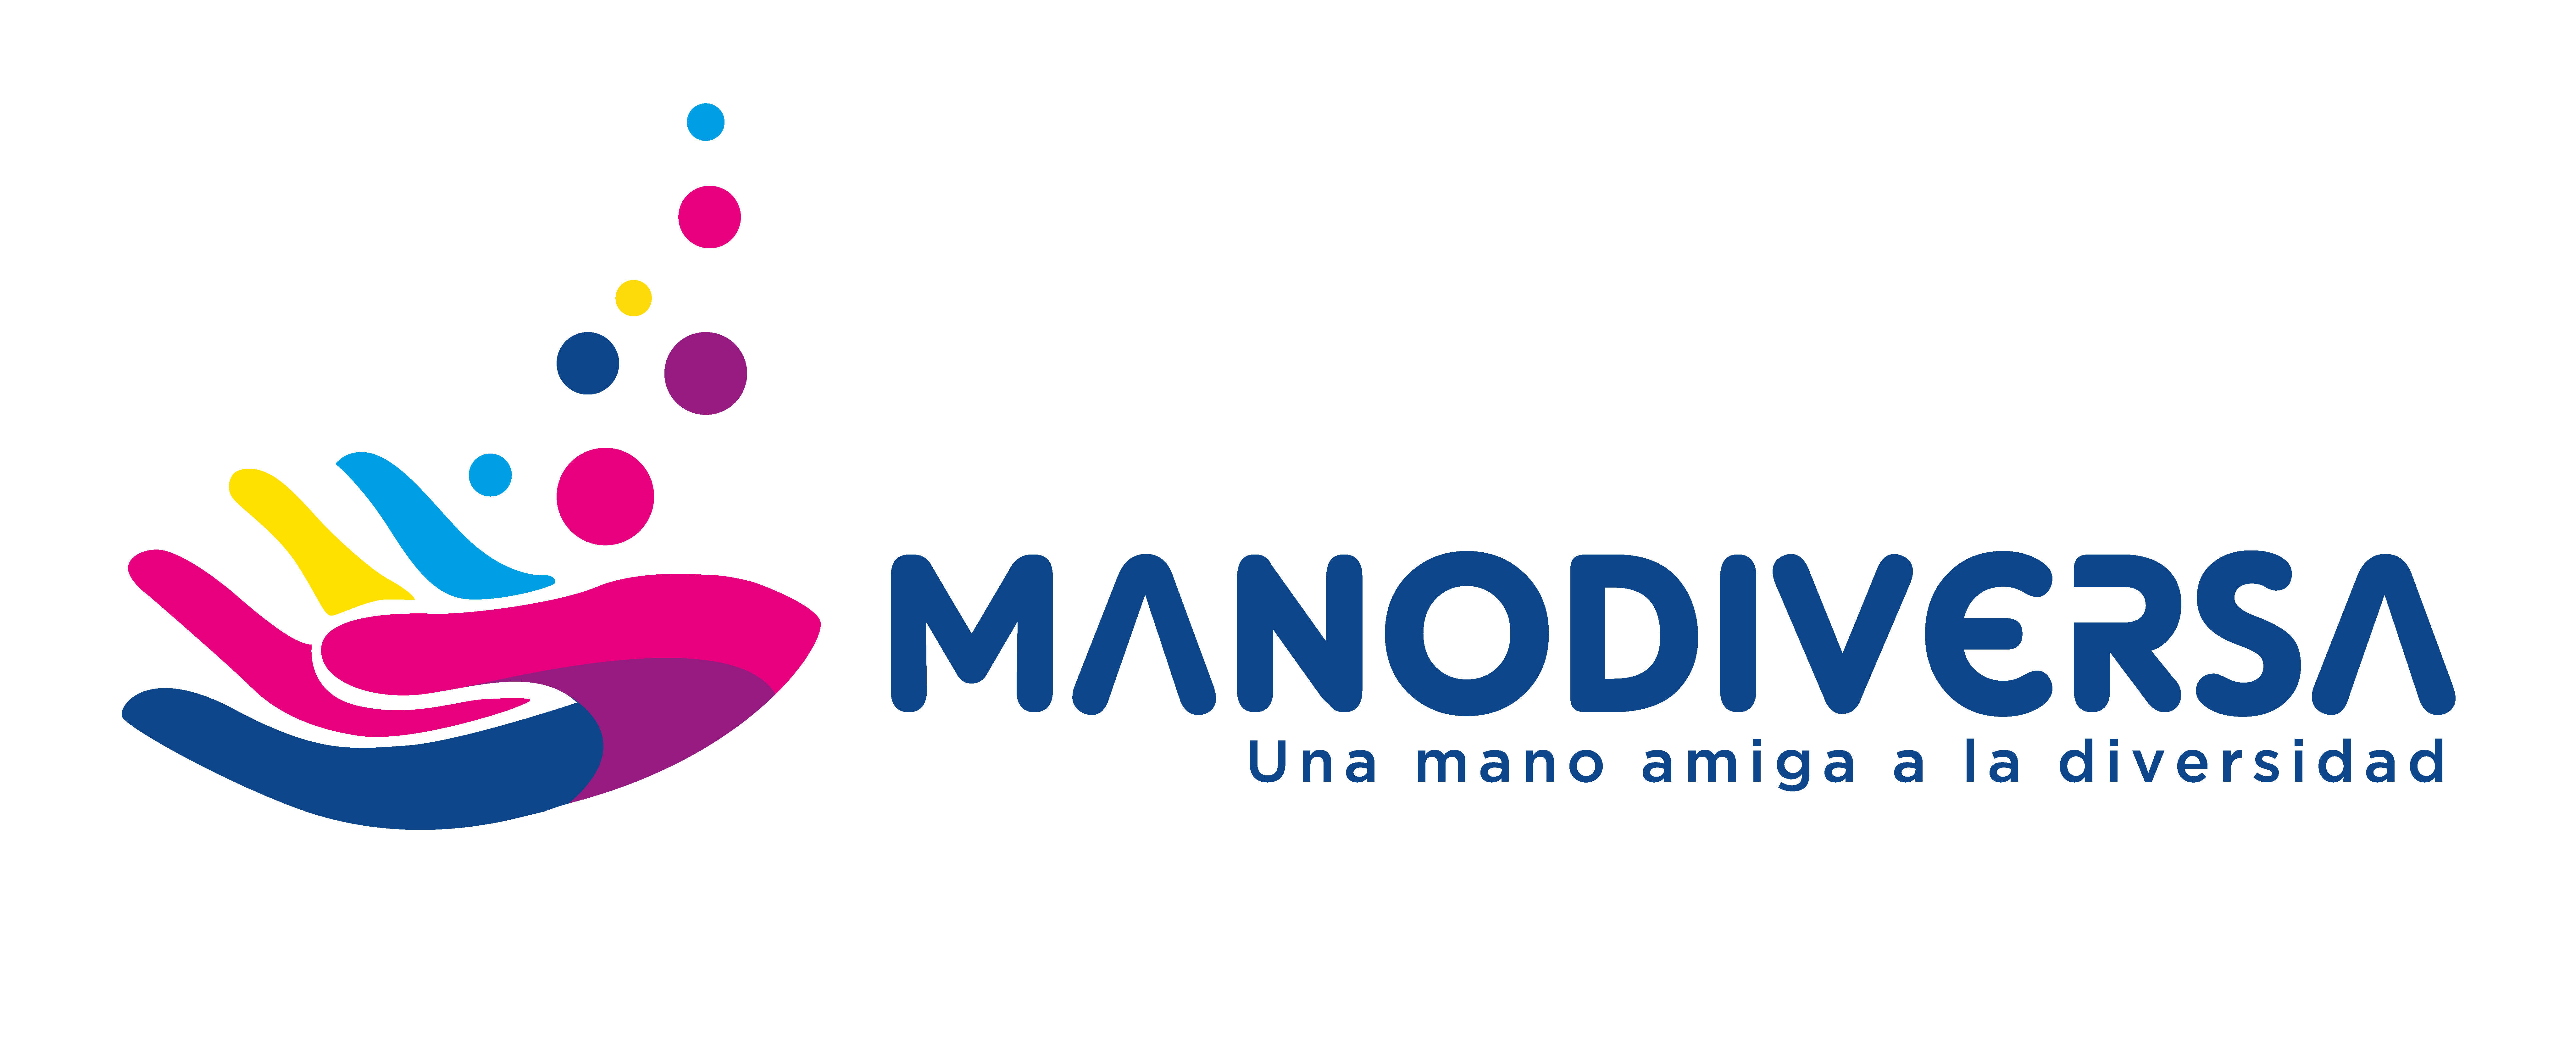 Manodiversa